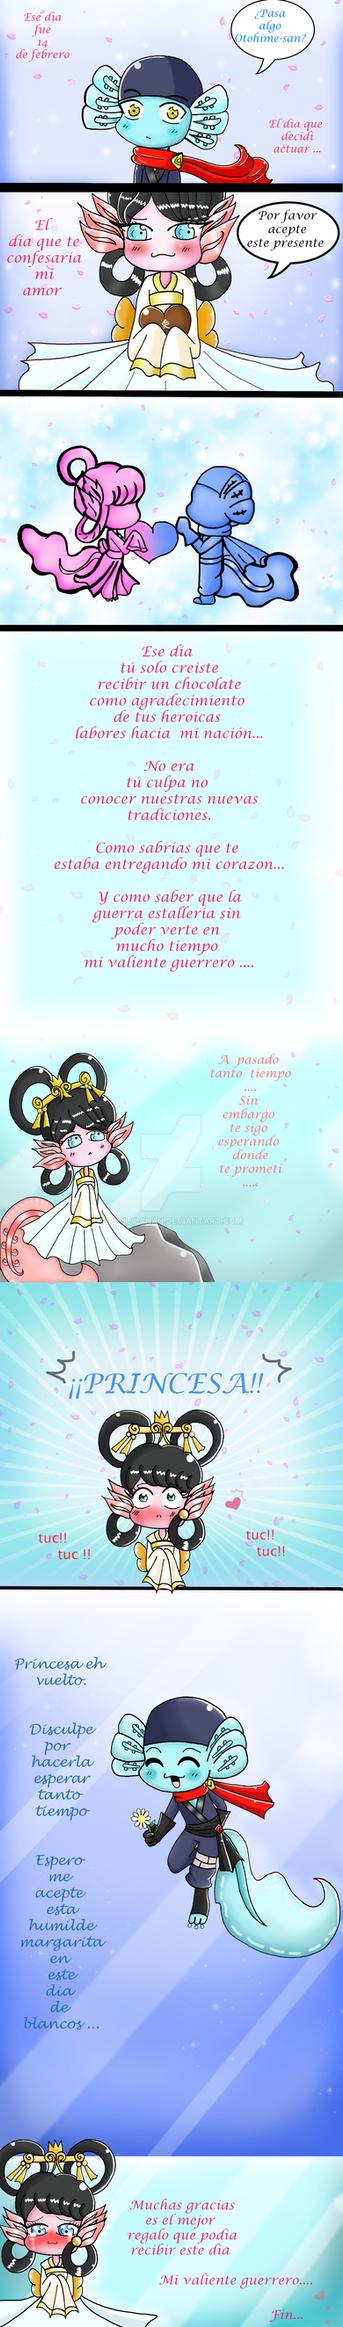 Historia de Amor Axolote (oc Pauly-chan) by Pauly-chan